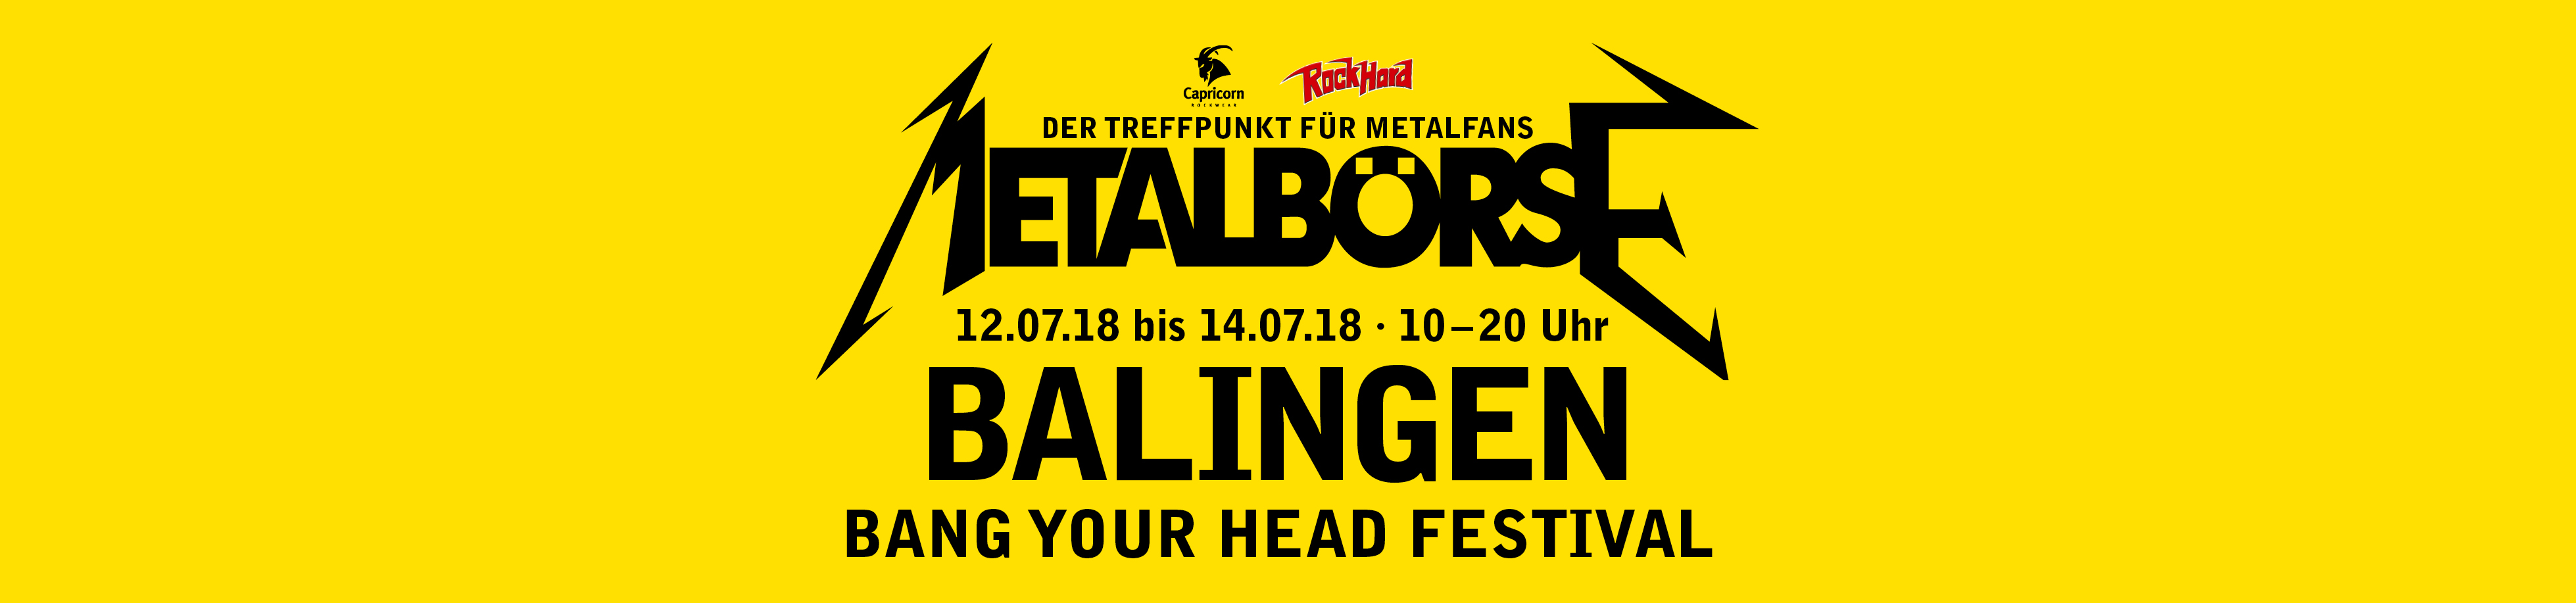 Metalbörse Balingen